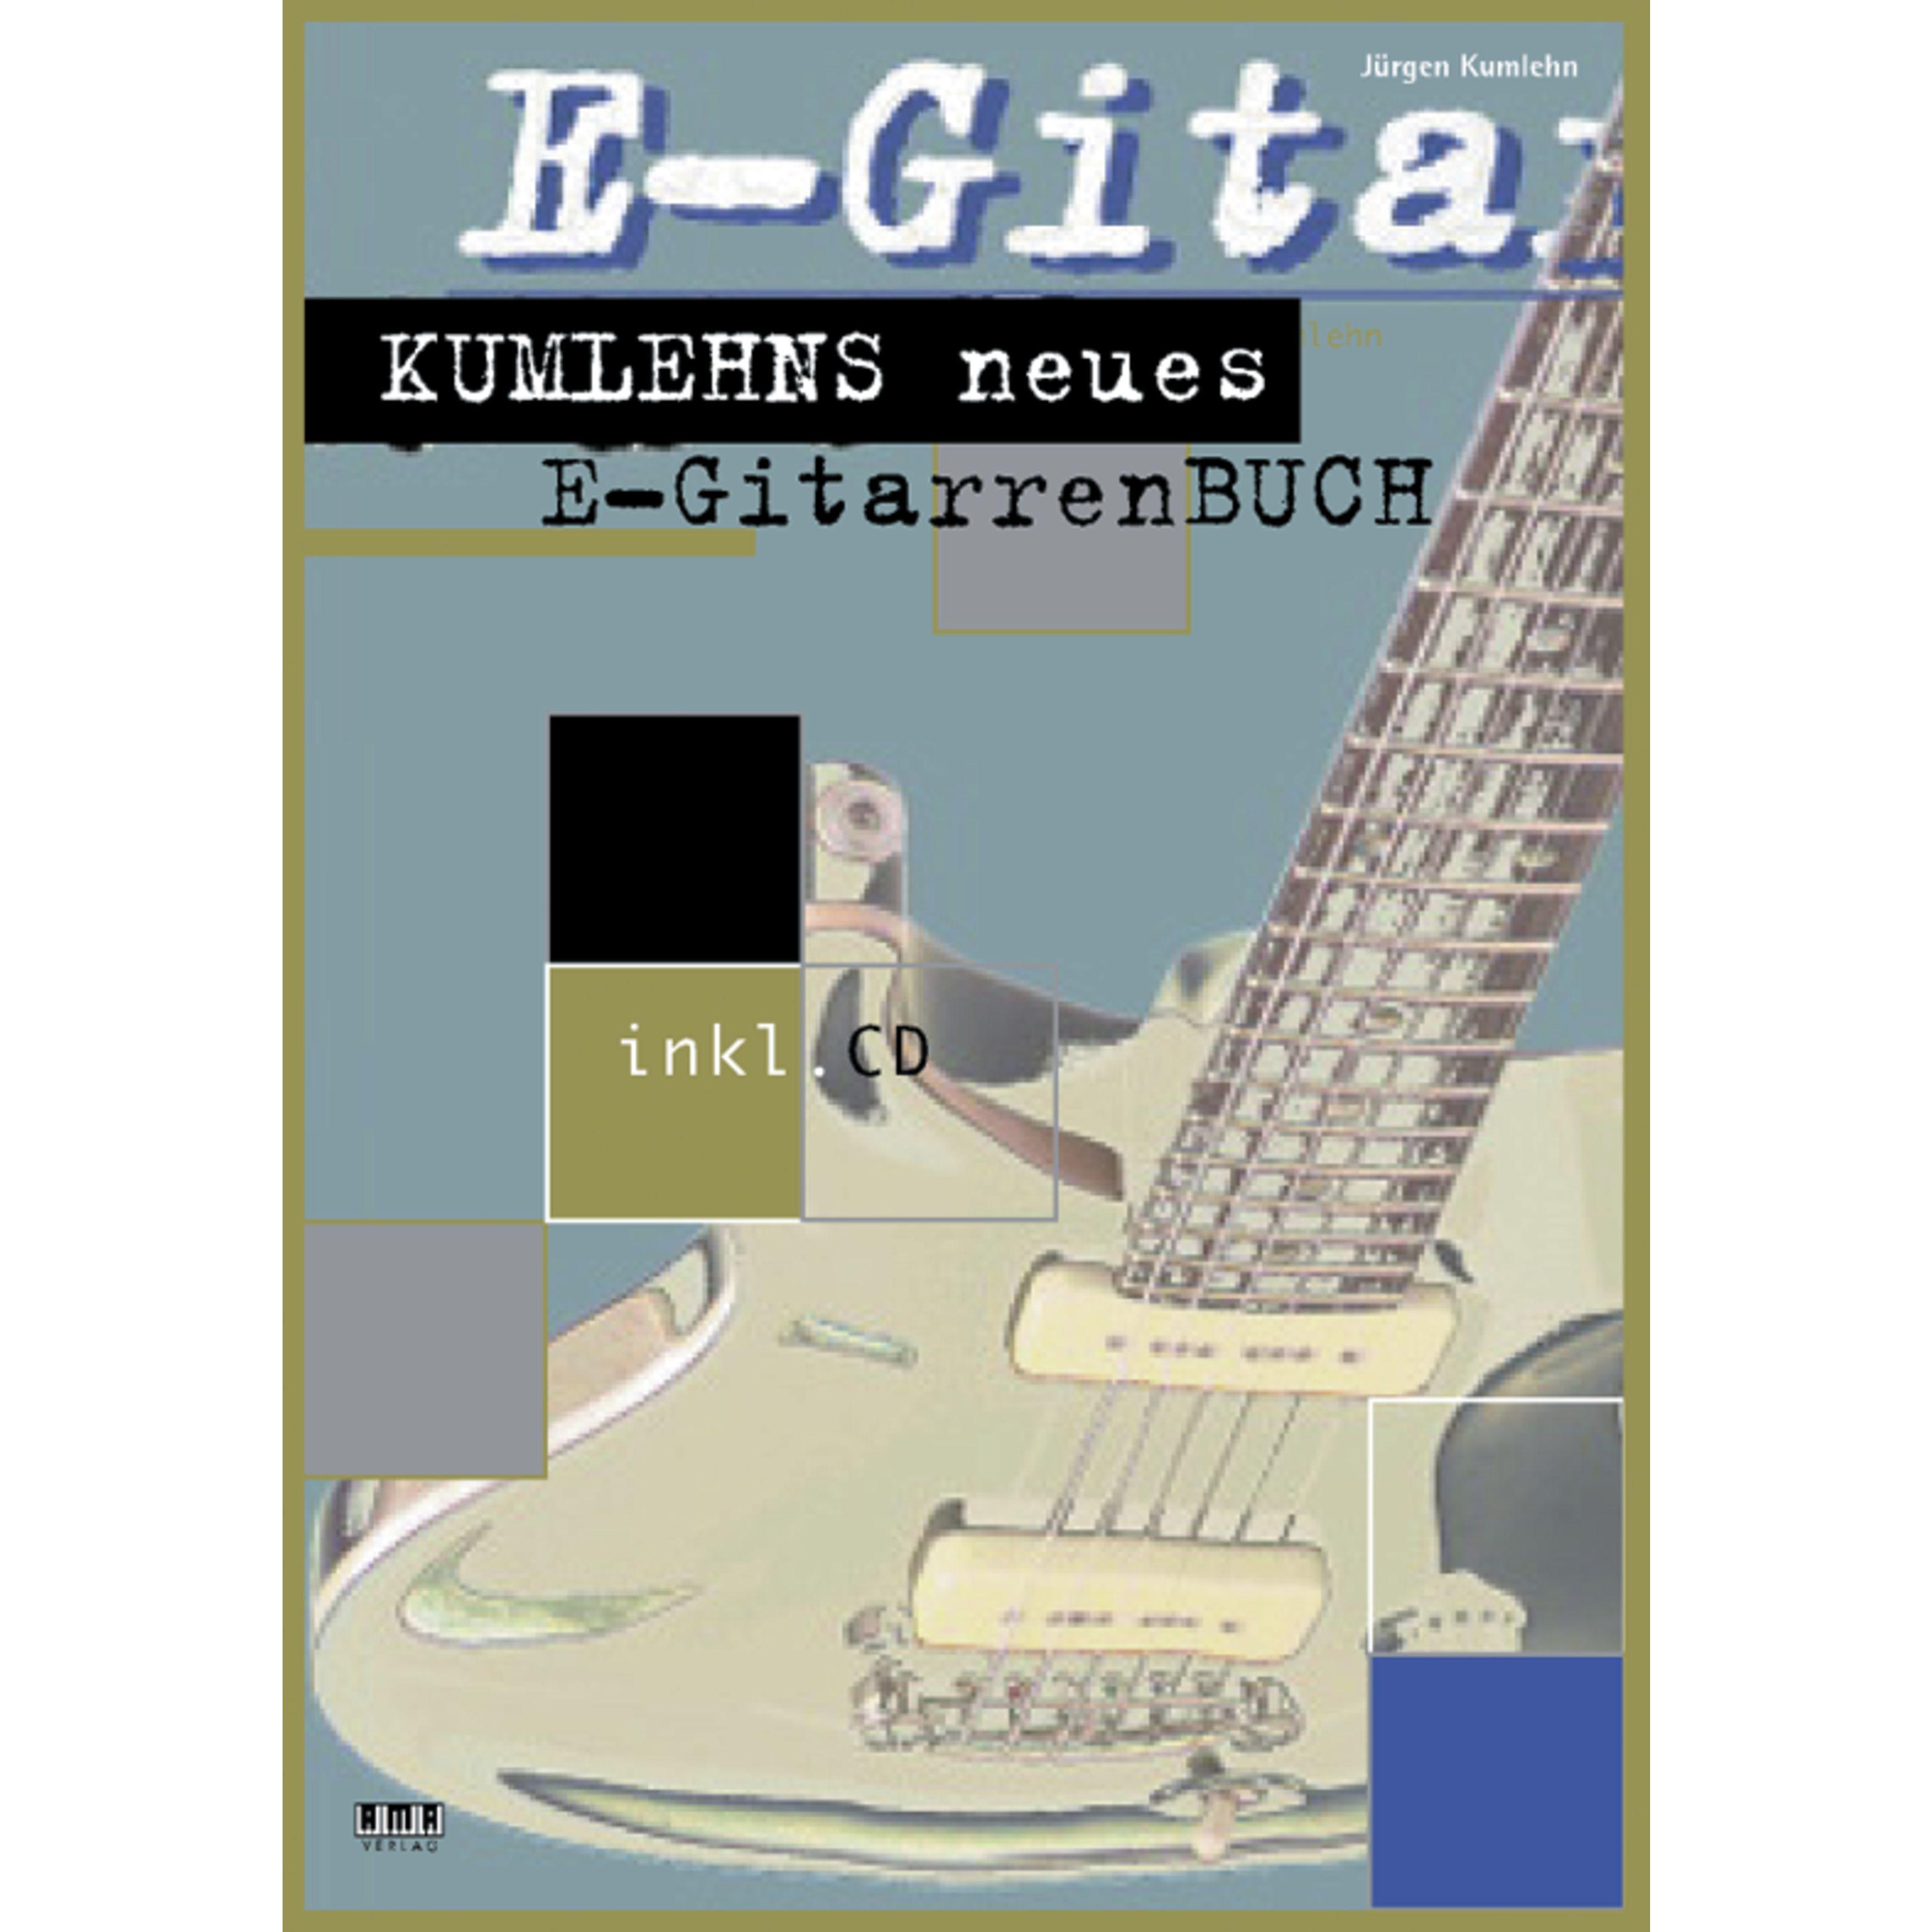 AMA Verlag - Kumlehns neues E-Gitarrenbuch  Jürgen Kumlehn,inkl. CD